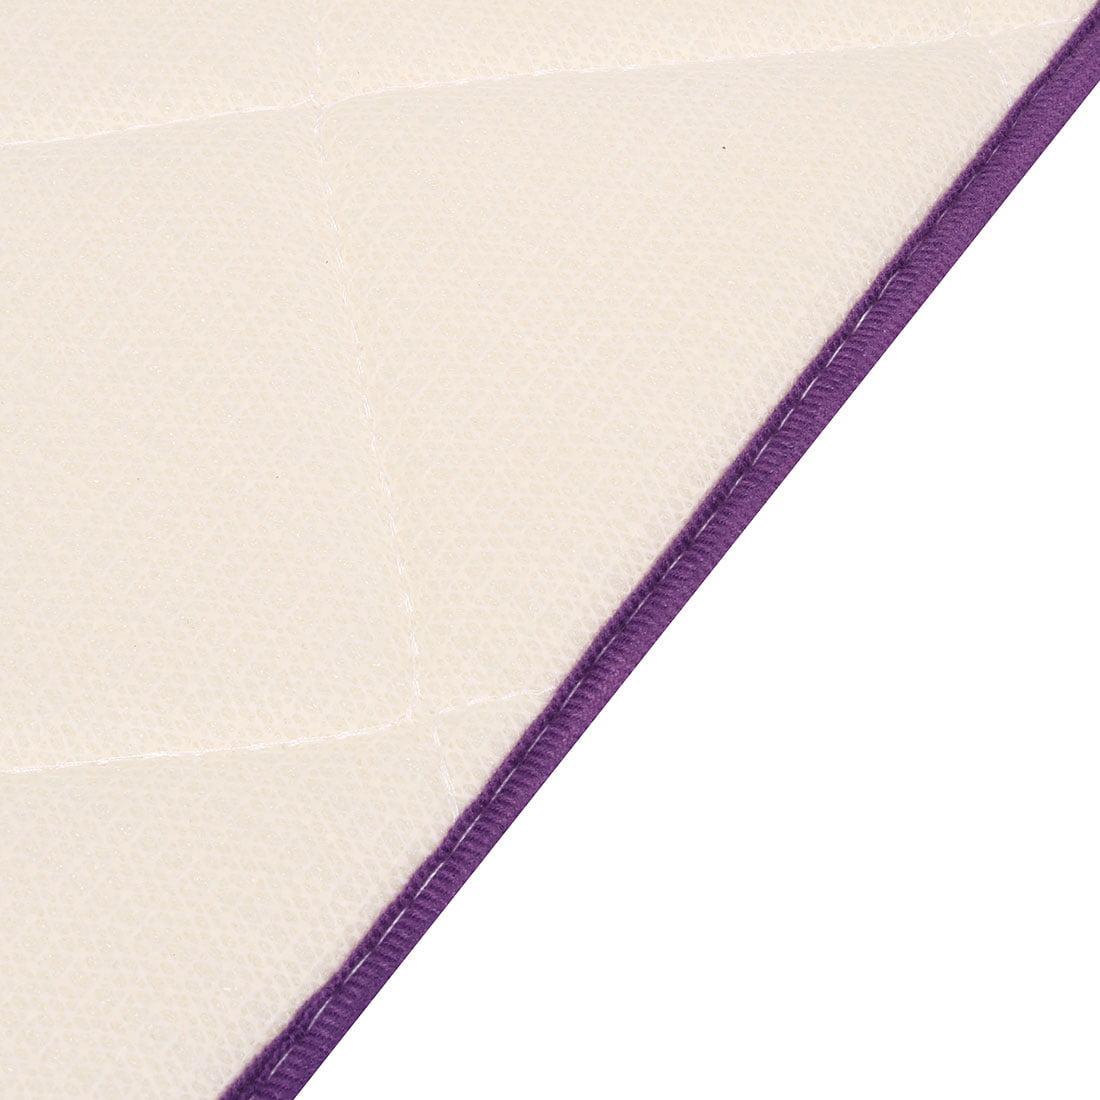 Bathroom Coral Fleece Slip Resistant Washable Floor Rug Carpet Doormat Purple - image 2 de 4